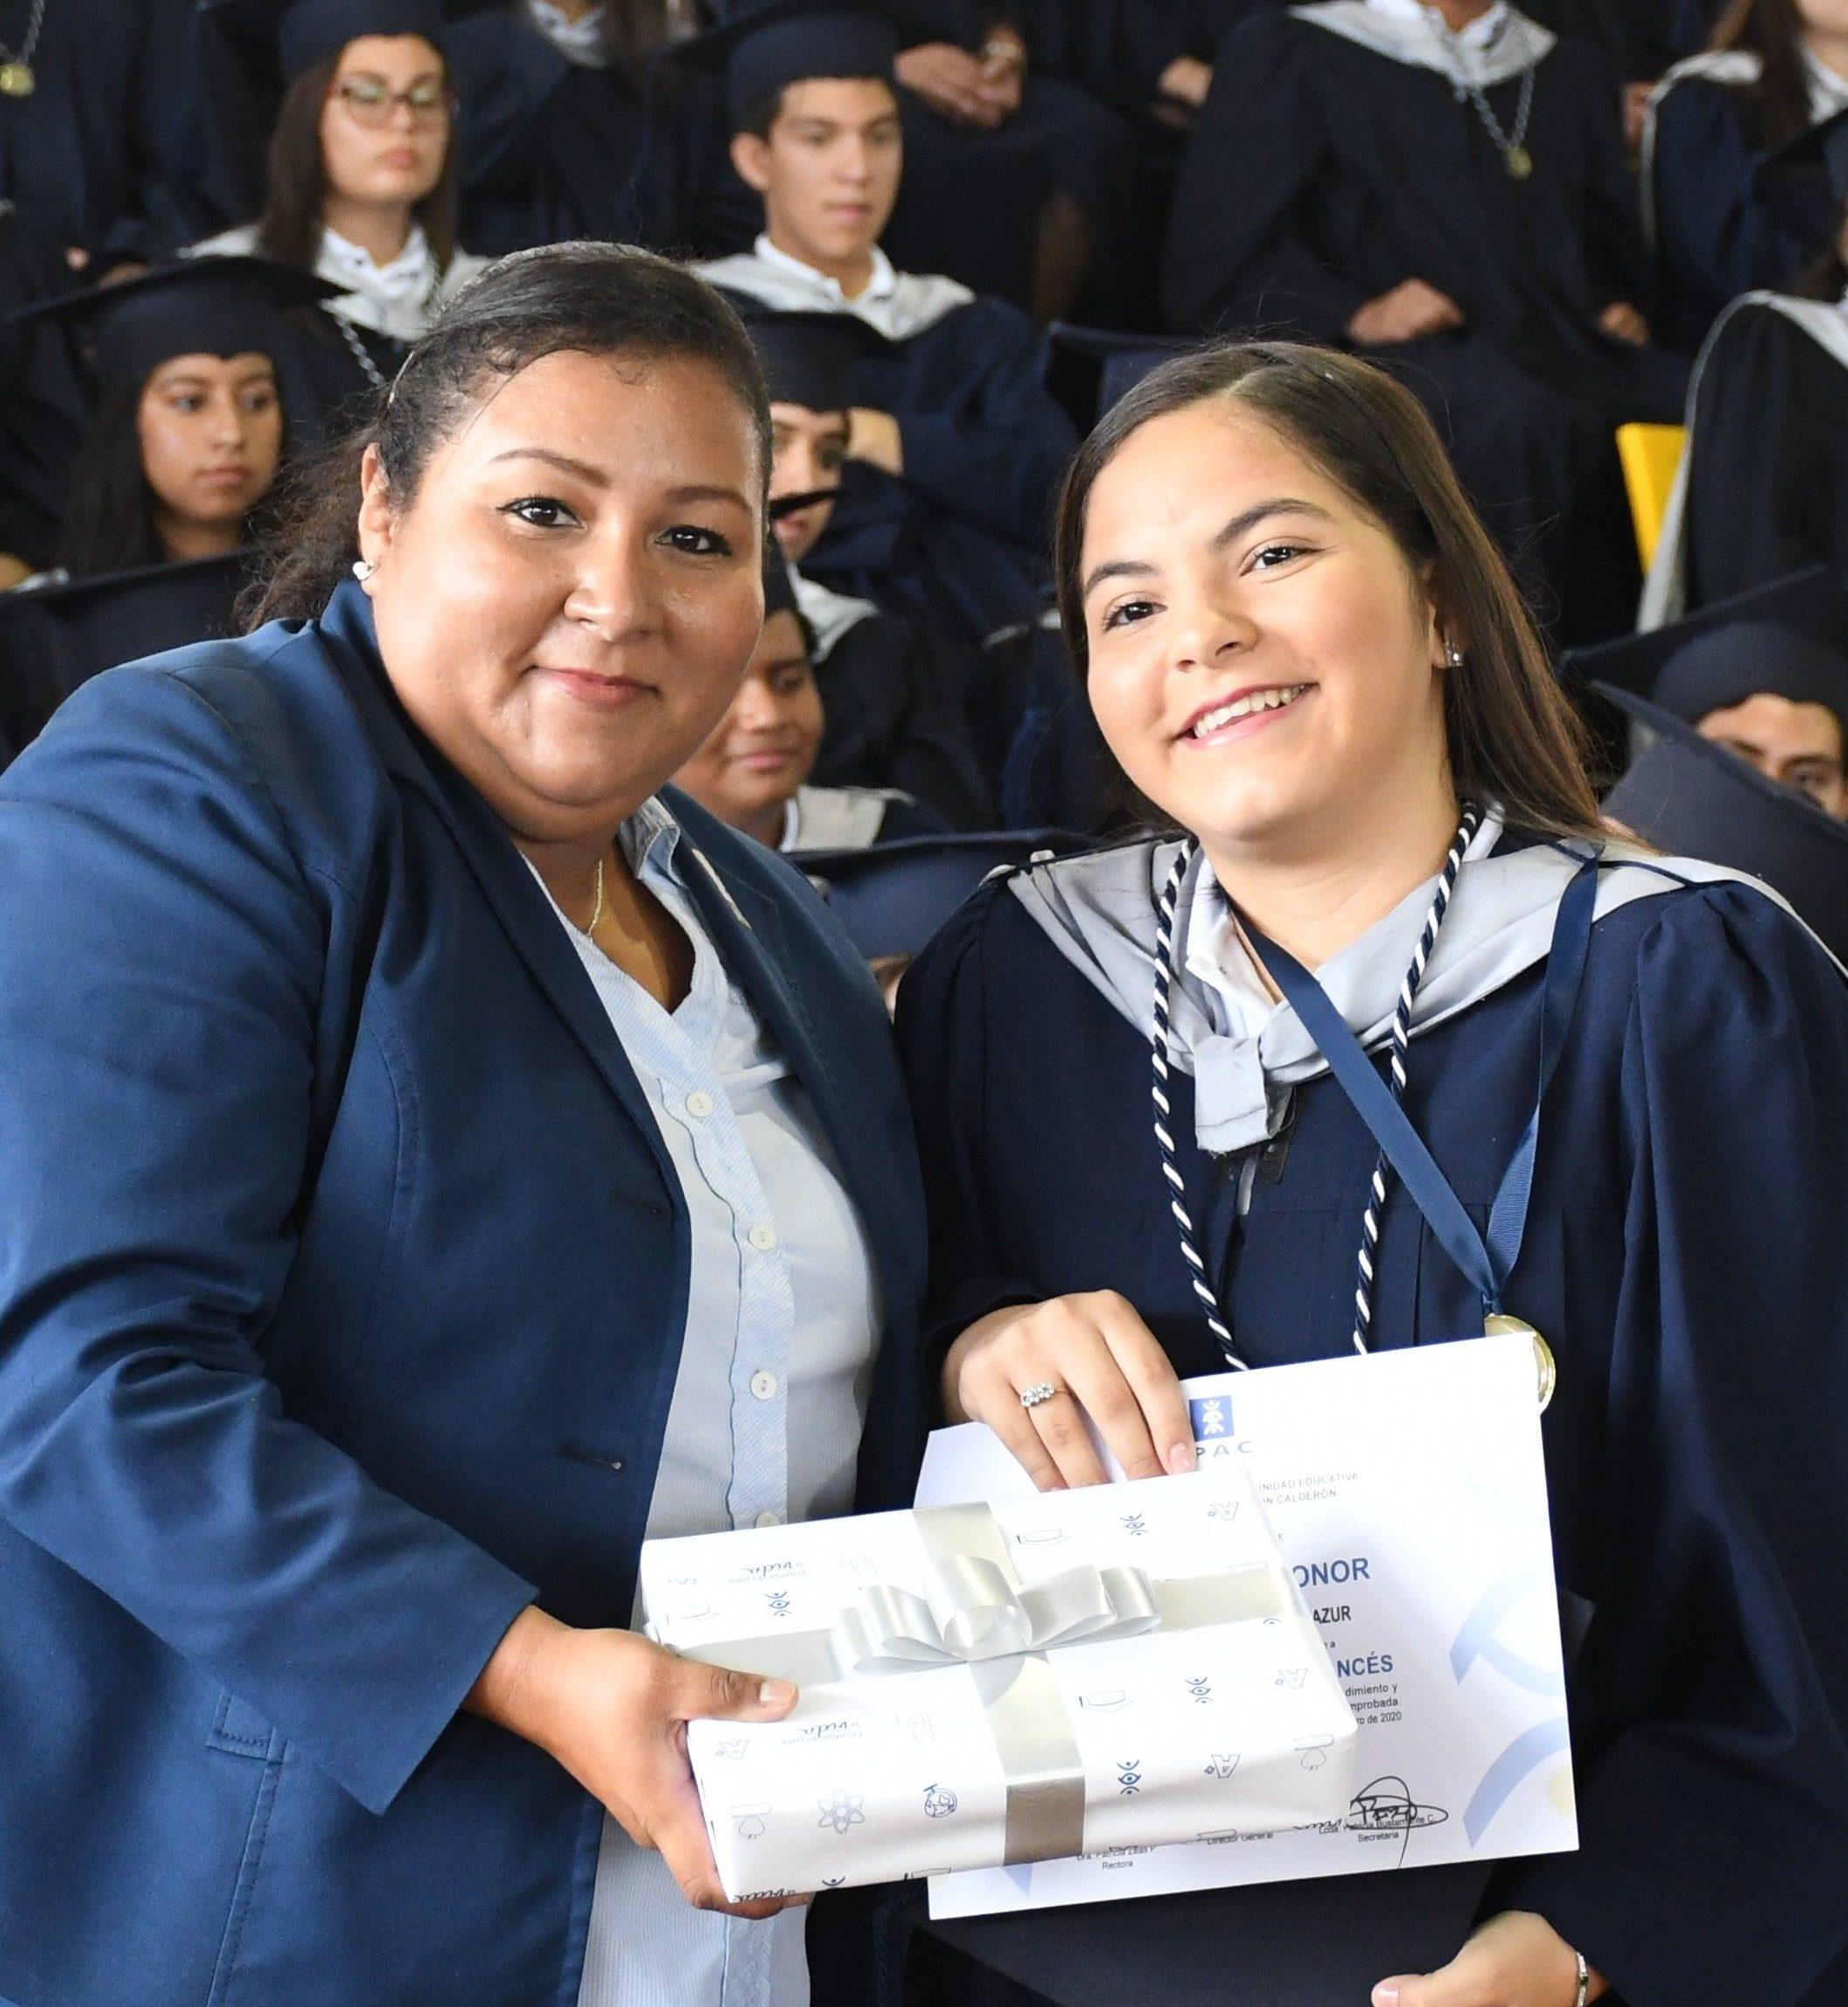 Entrega de reconocimiento a la Mejor Alumna FrancÇs a cargo de la Mme. Raquel Suasti Directora del µrea de FrancÇs